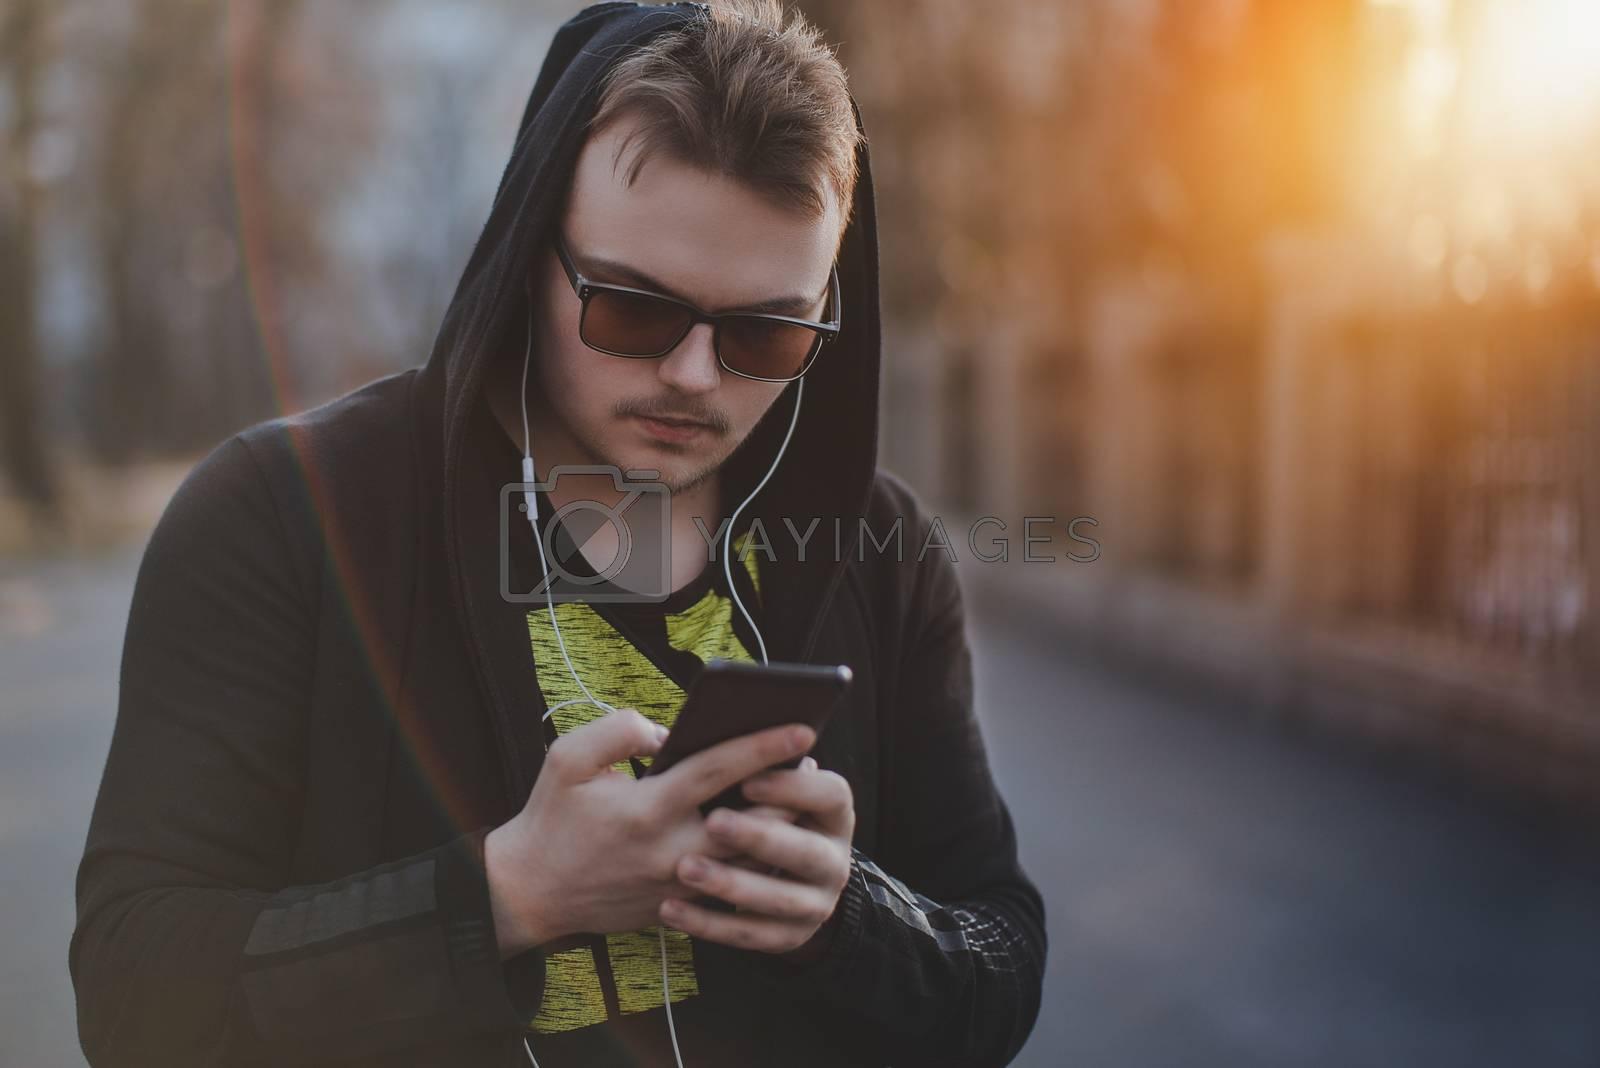 Man in Hood with headphones looking at smartphone.